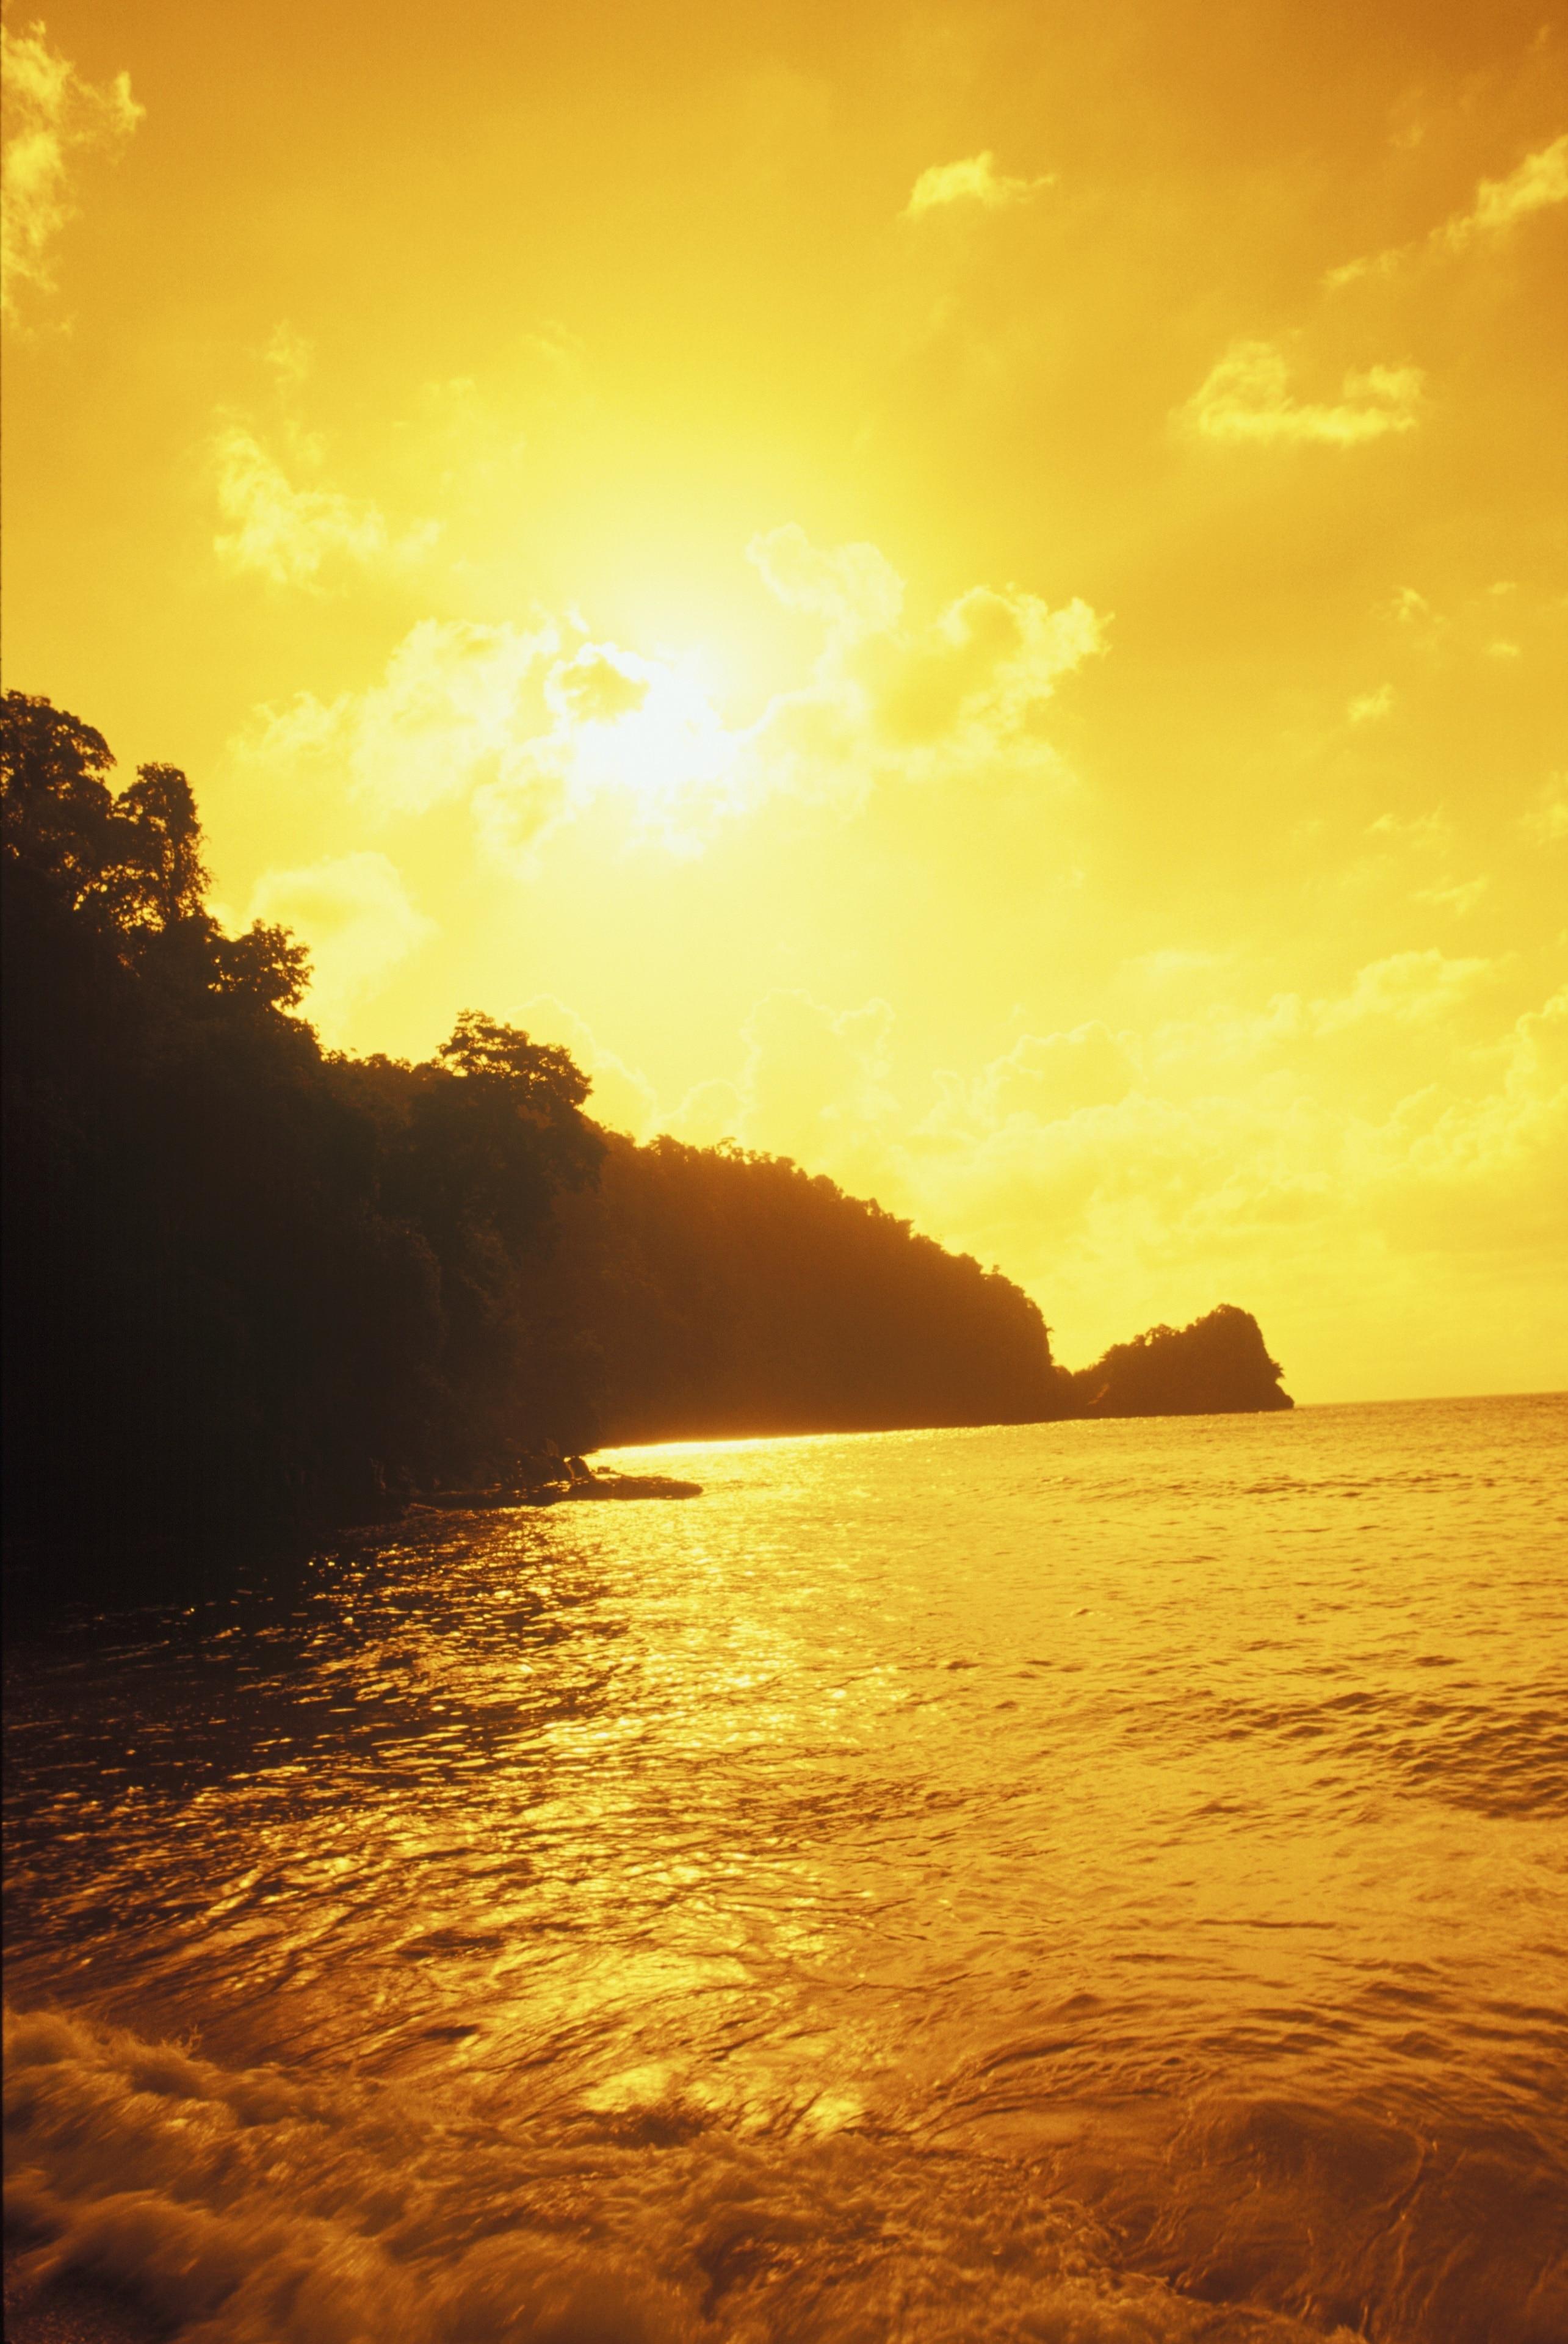 Pointe-Noire, Basse-Terre, Guadalupa